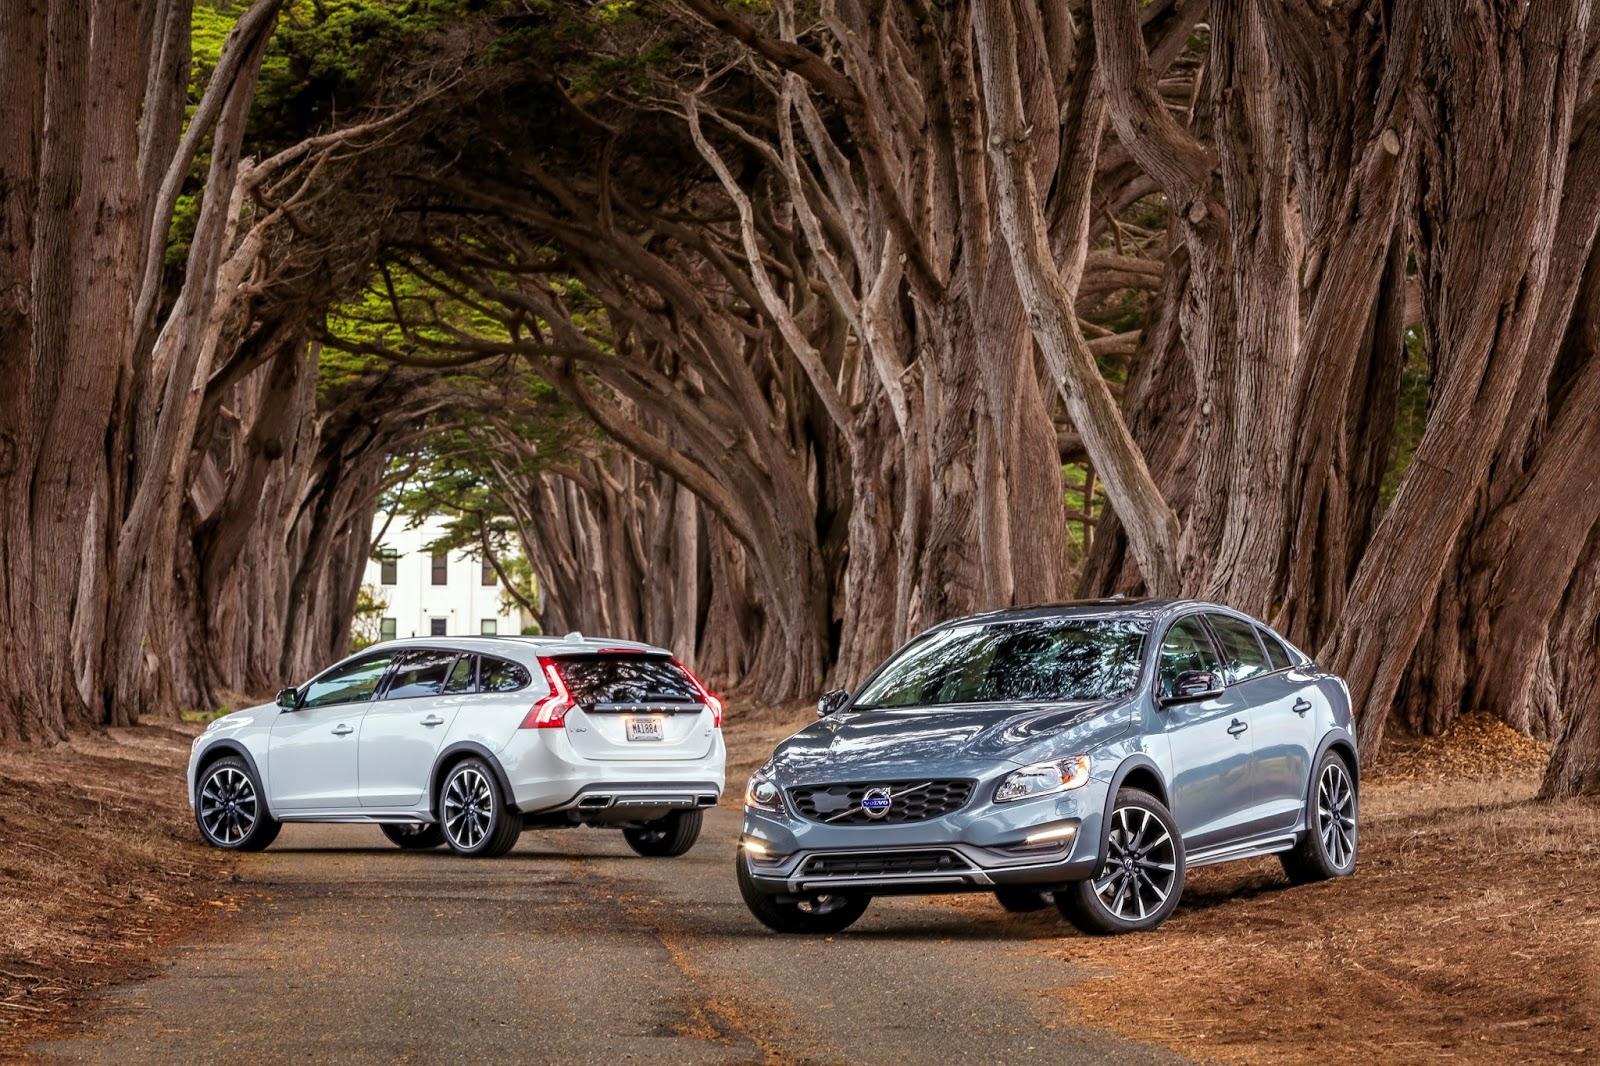 VOLVO%2BS60%2BCROSS%2BCOUNTRY%2B%2526%2BV60%2BCROSS%2BCOUNTRY Η Volvo με το νέο S60 Cross Country δημιουργεί το πρώτο sedan με διττό χαρακτήρα